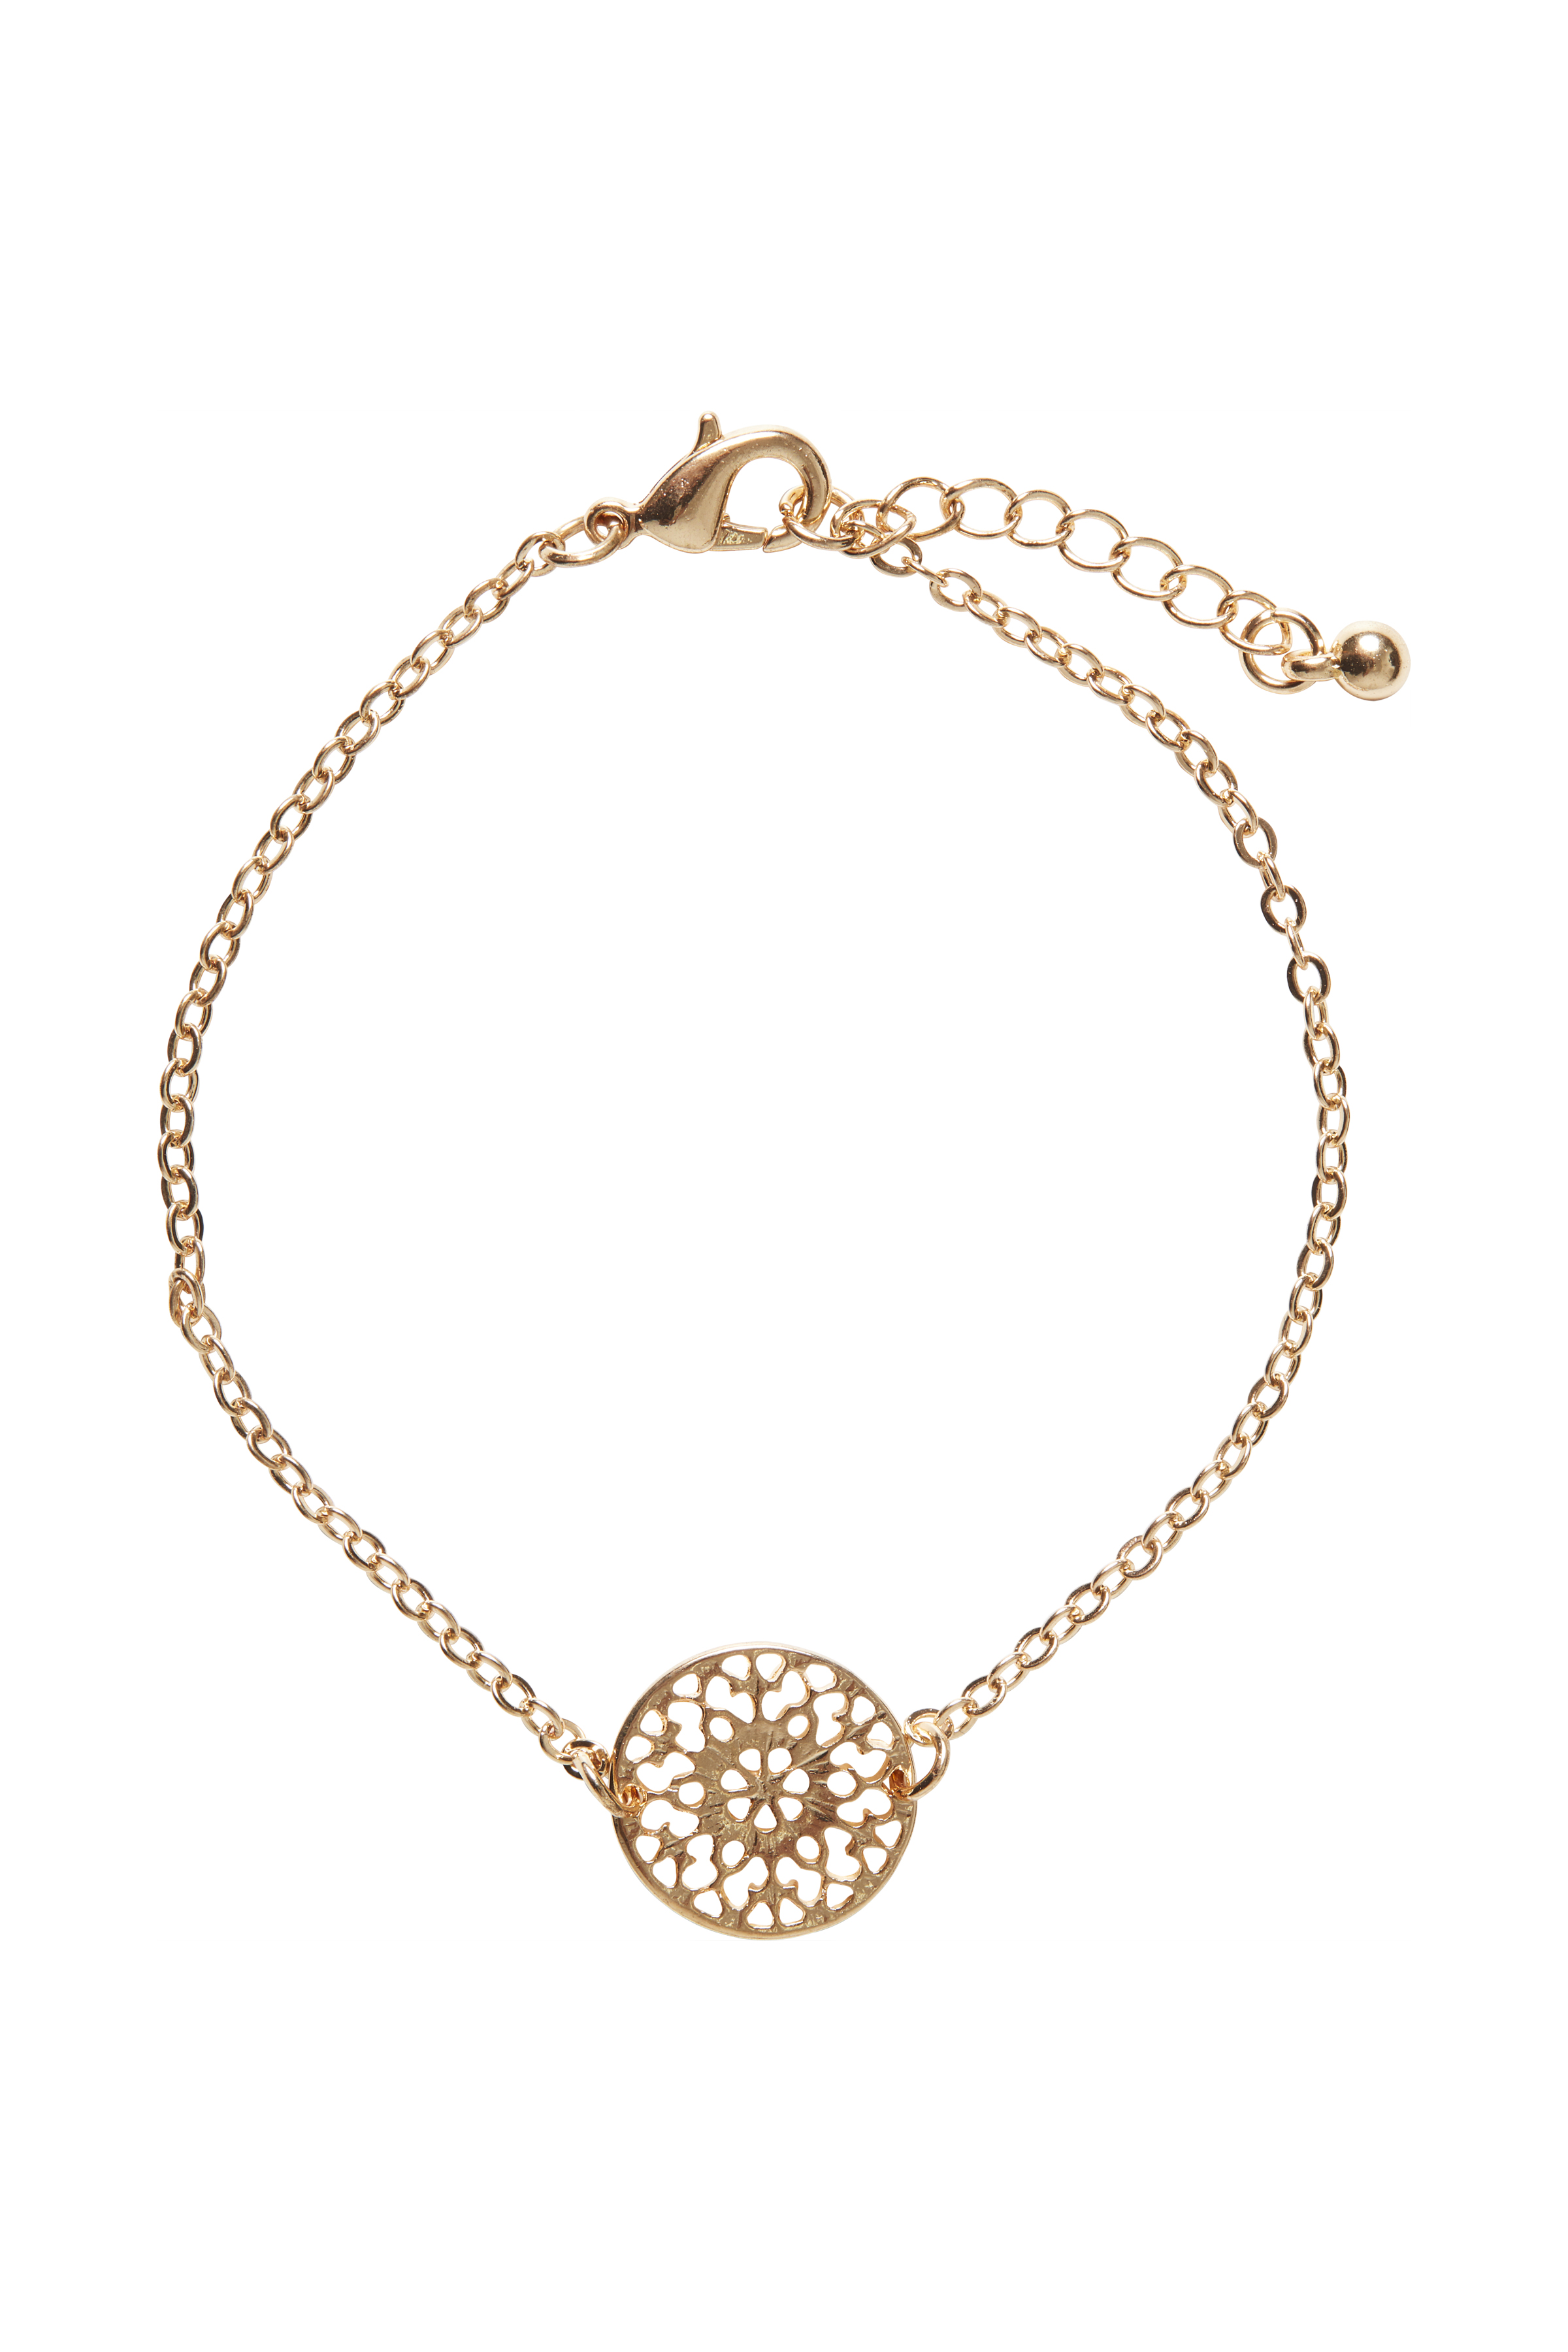 Fransa Dame Armbånd  - Guld